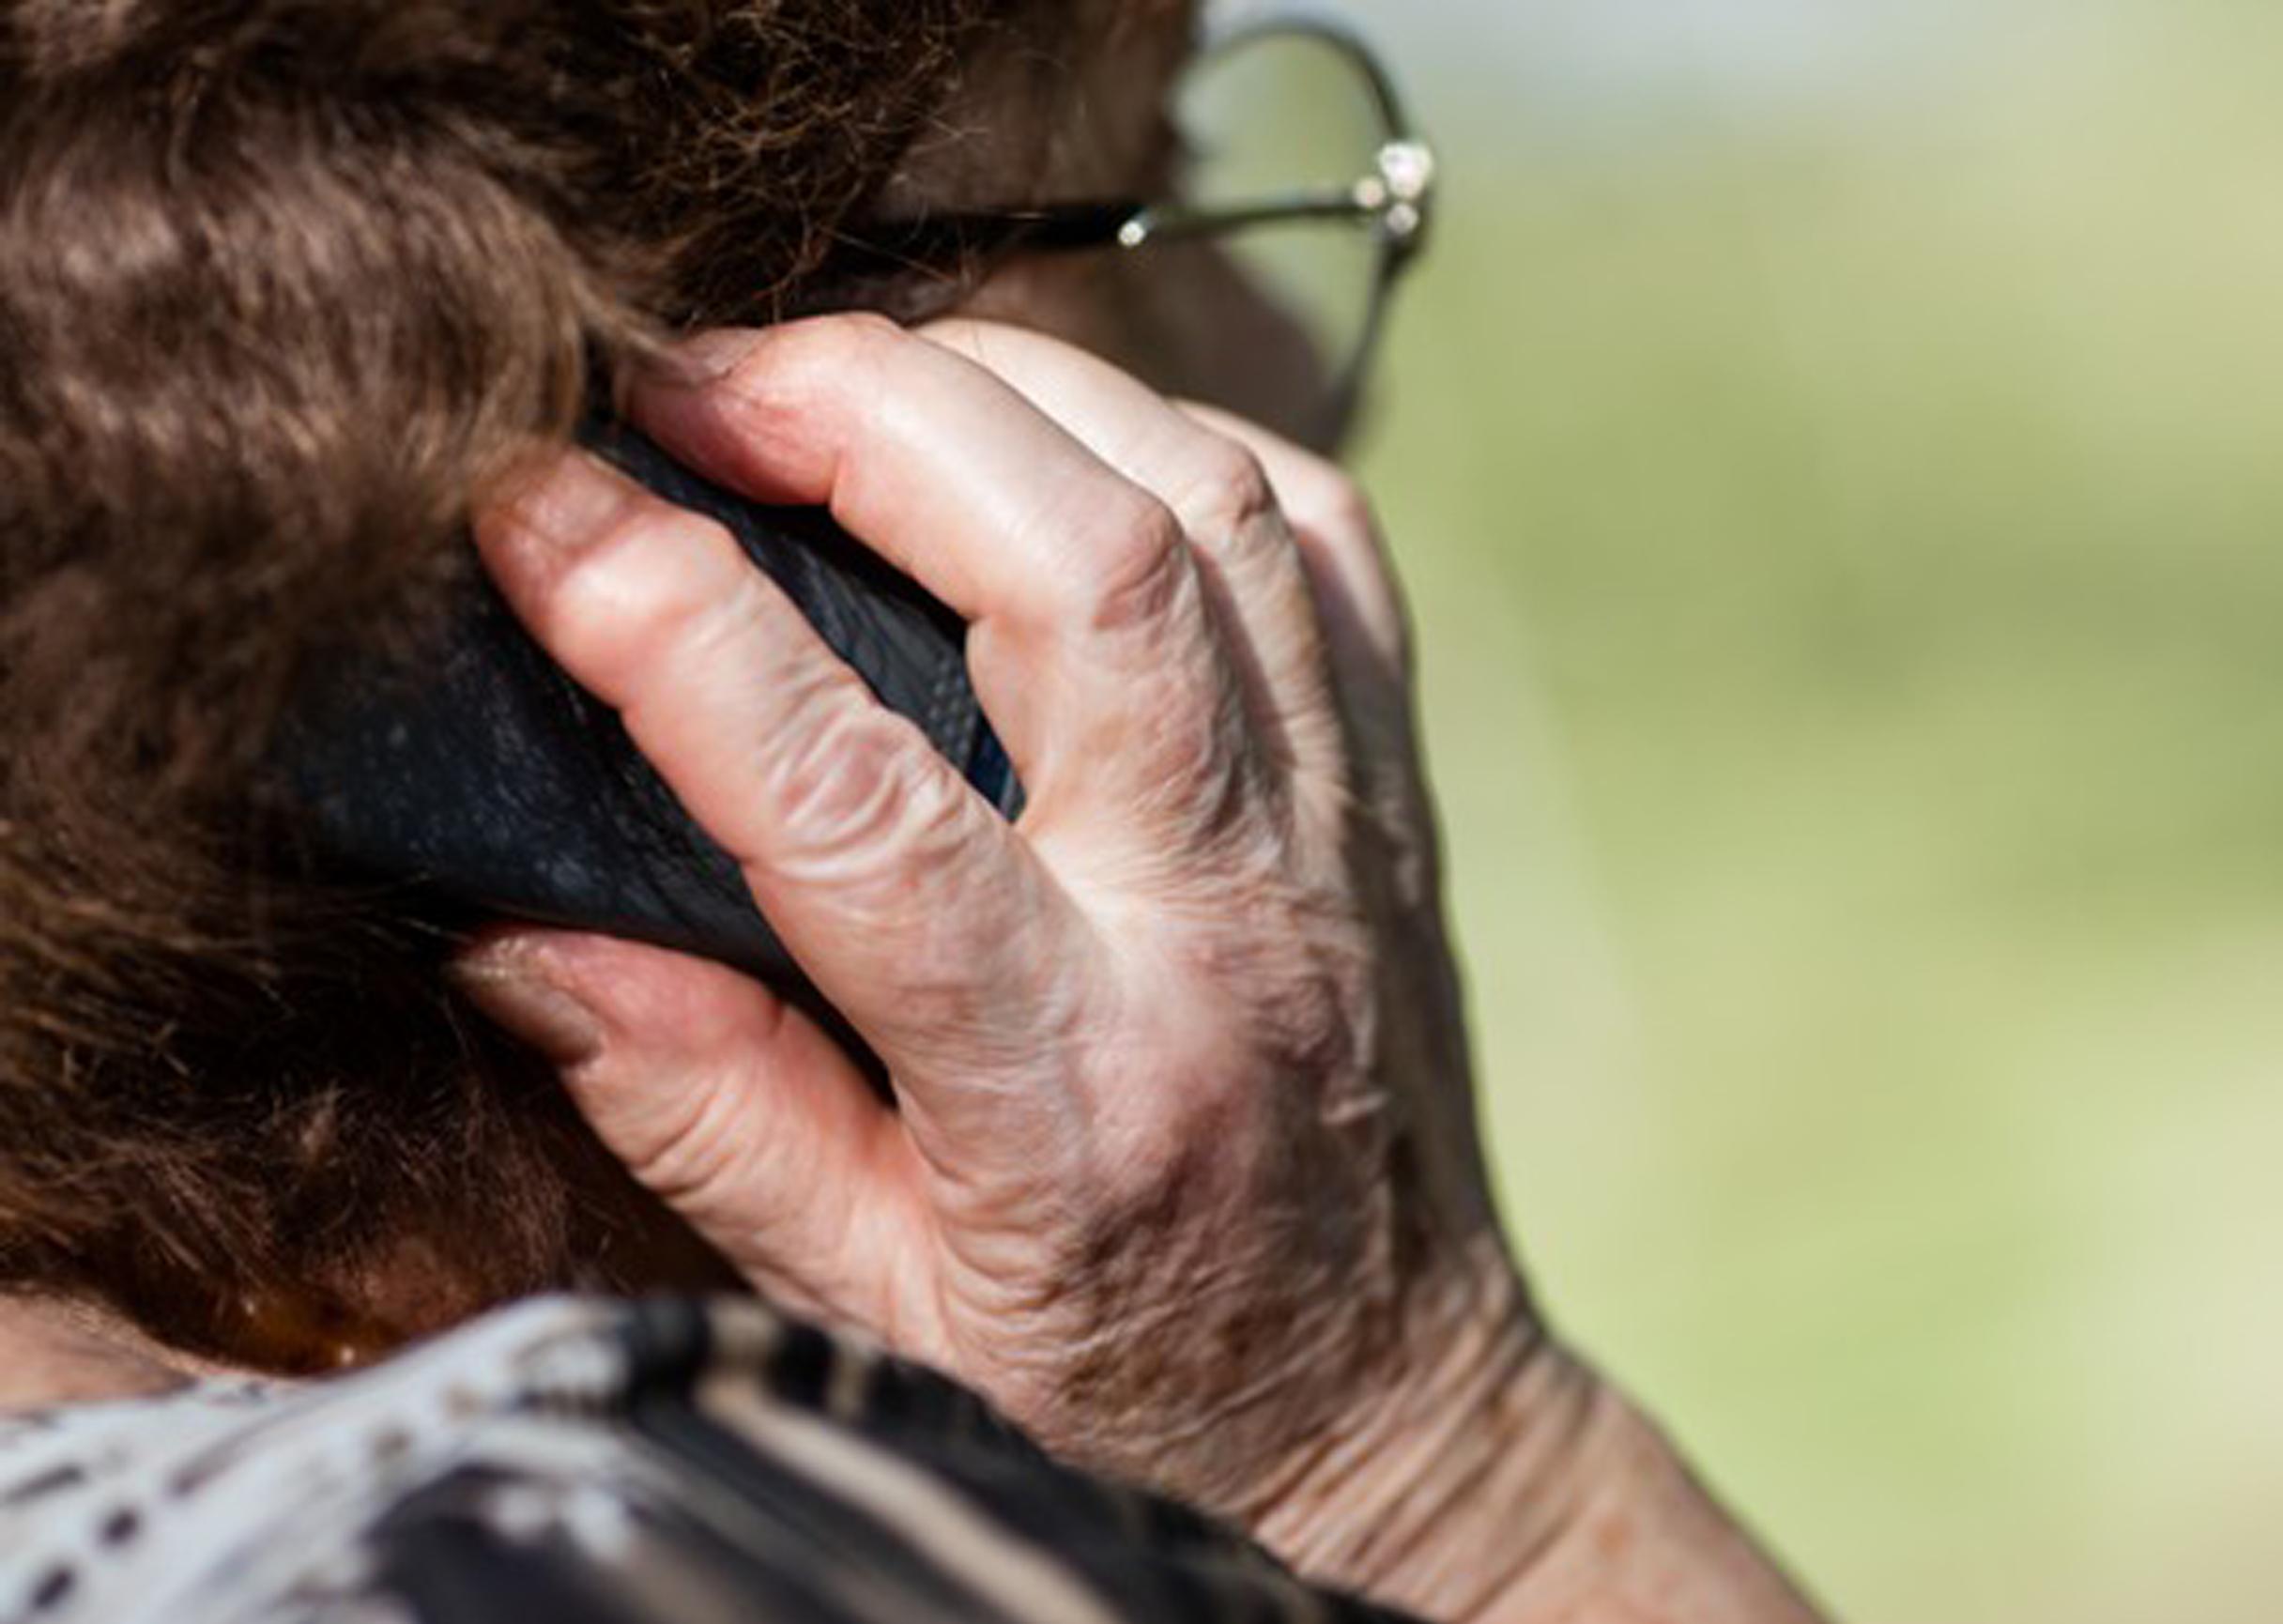 Elderly woman checks hearing with Tunefork